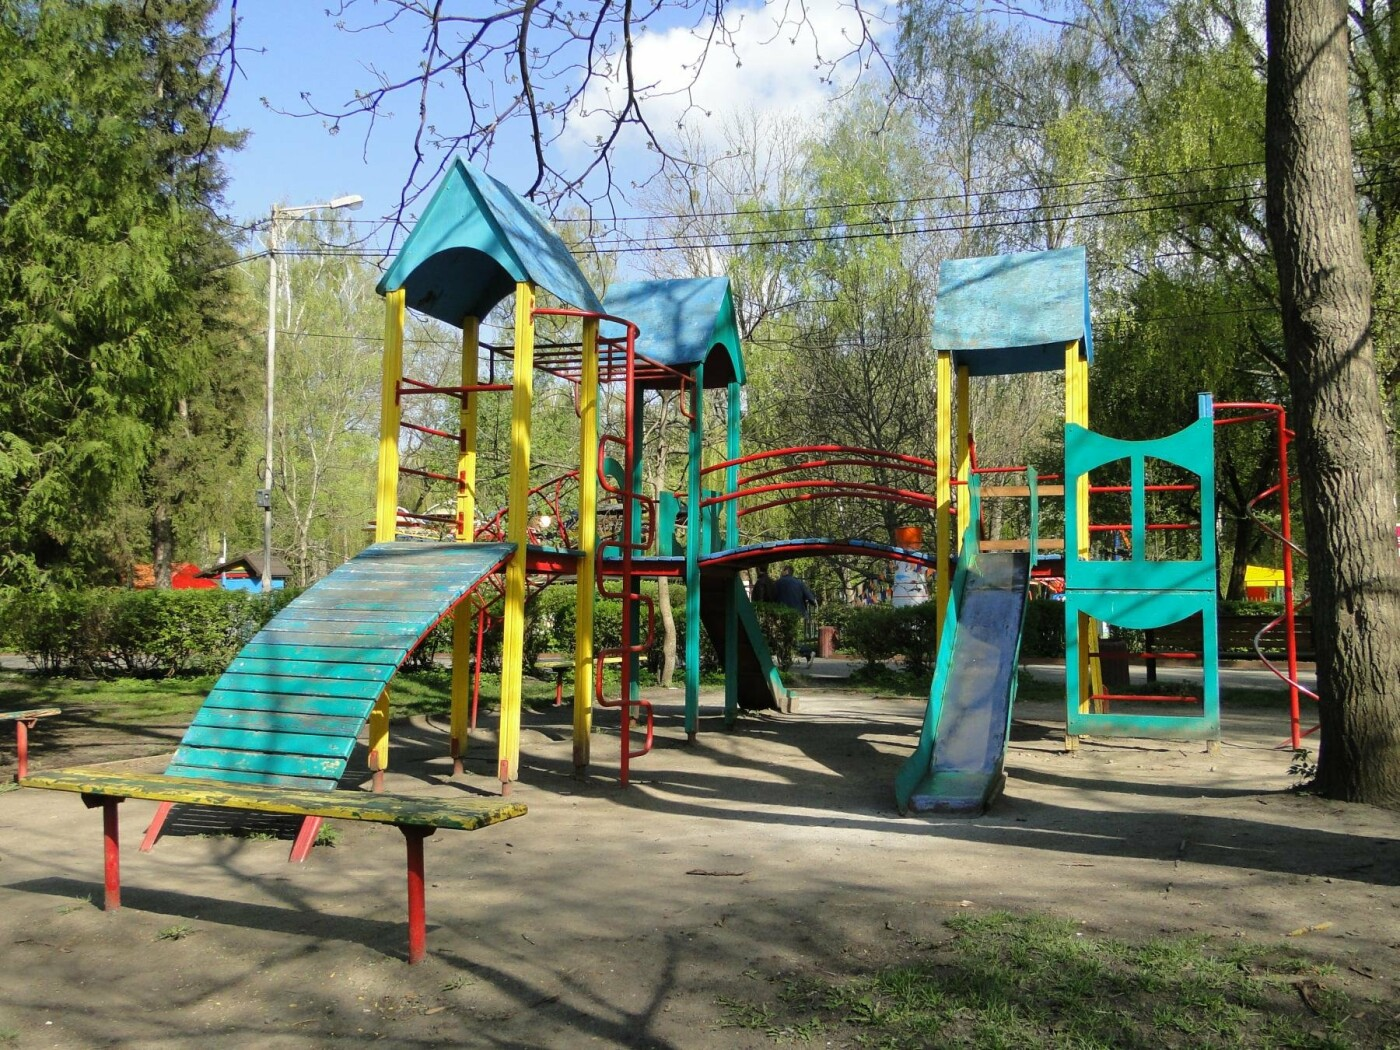 Травмоване дитинство: де зачаїлася небезпека на дитячому майданчику в парку Чекмана. ФОТО, фото-4